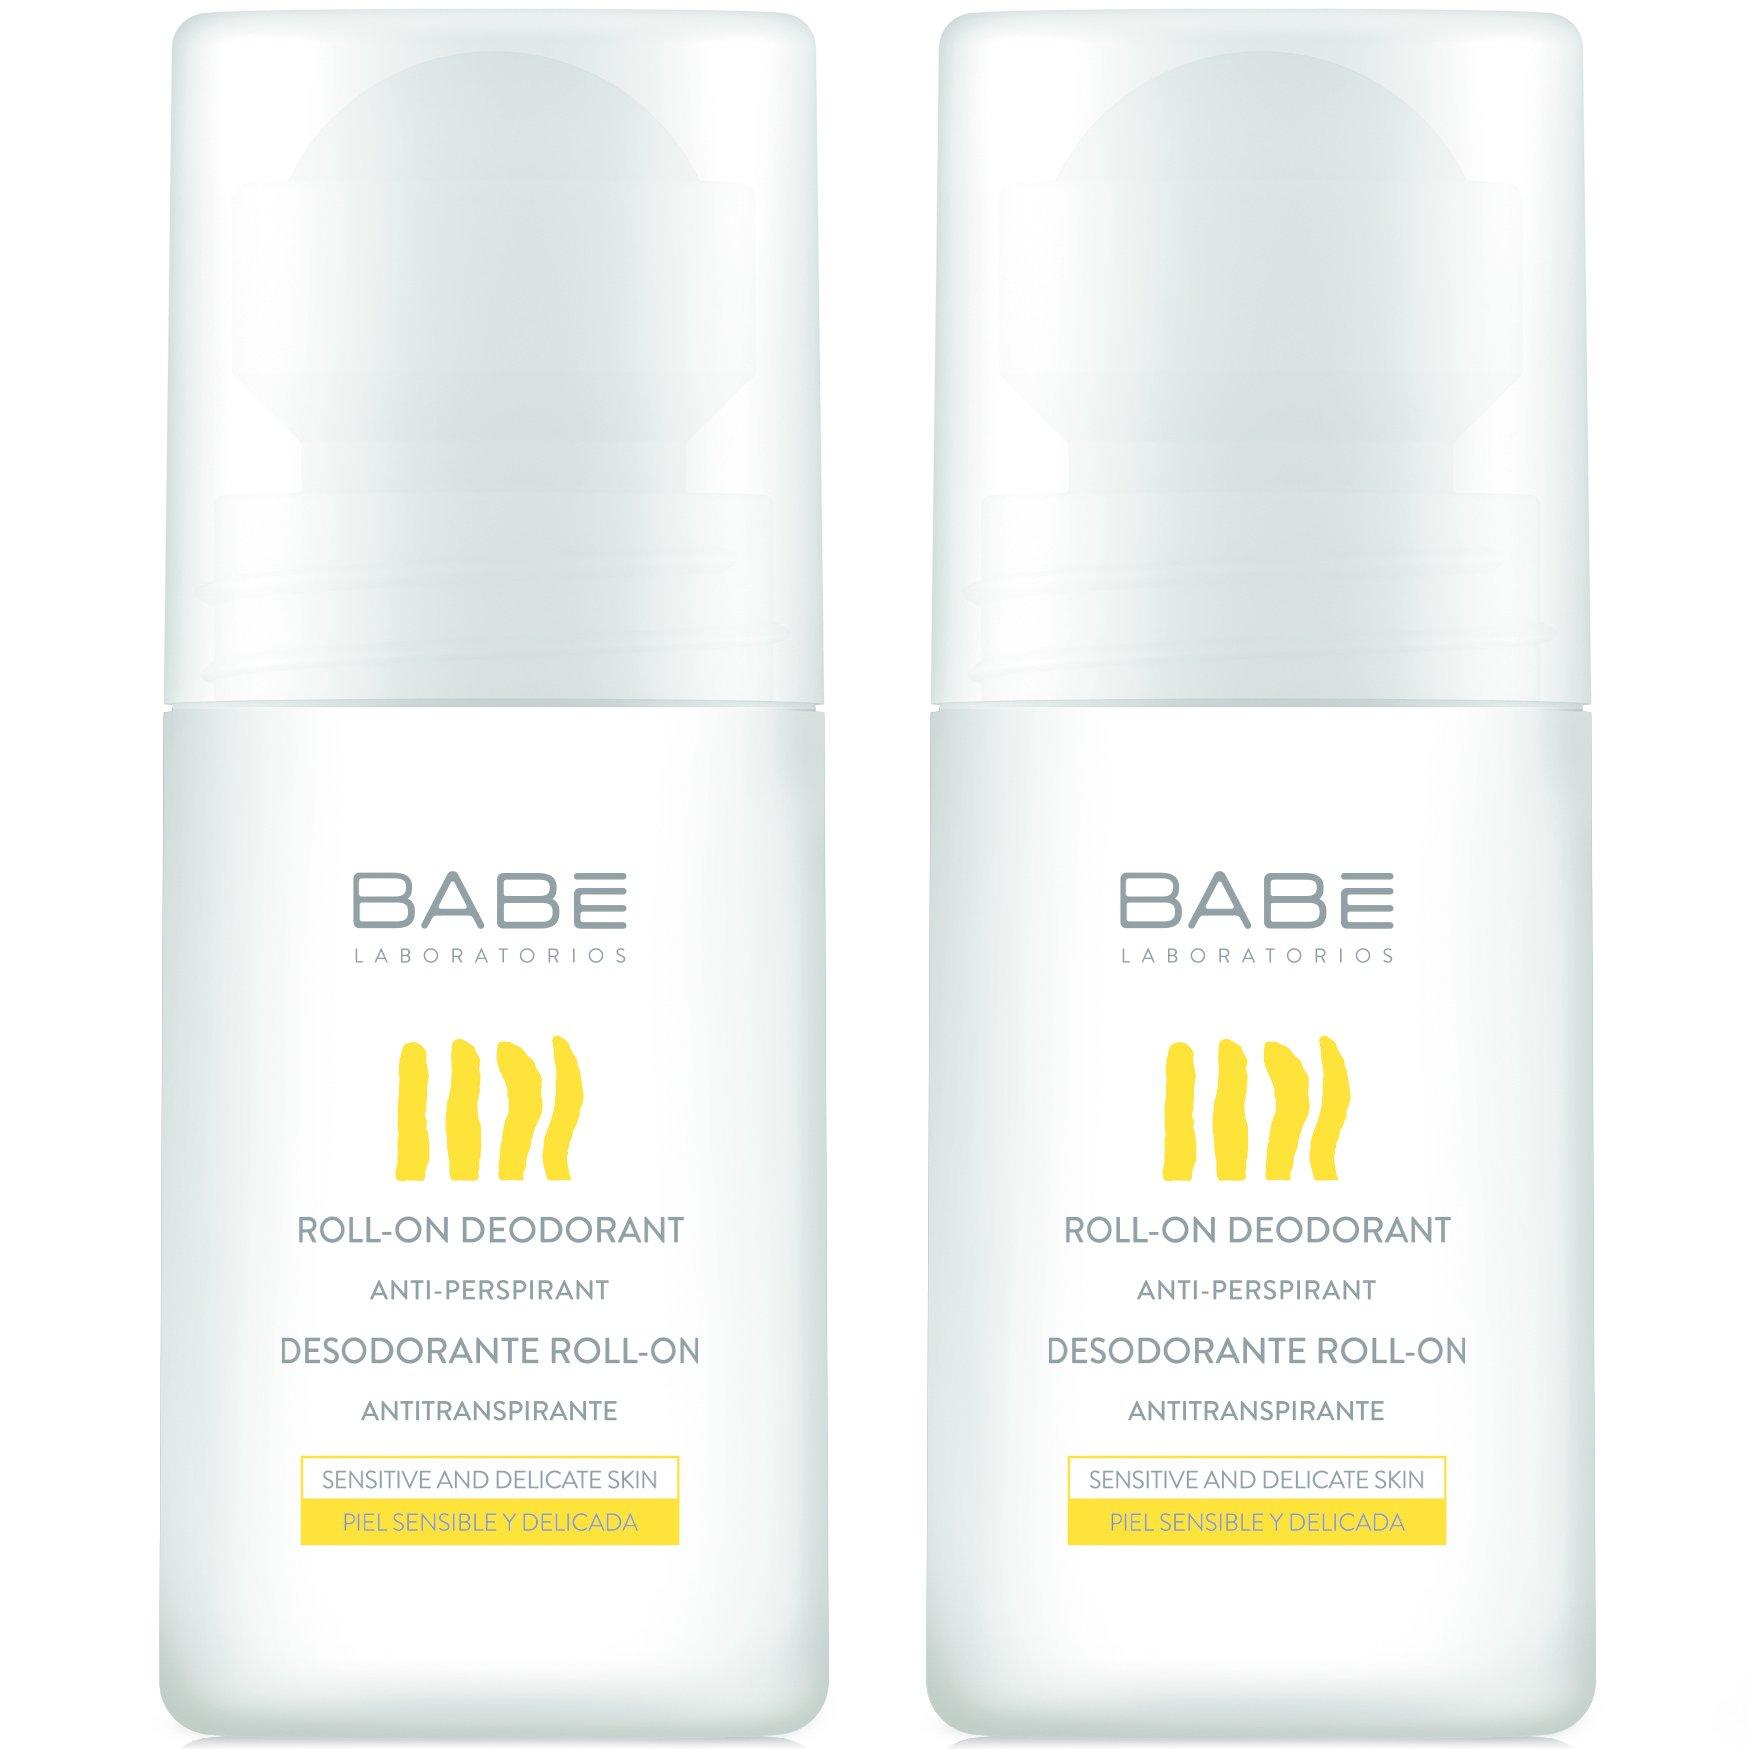 Babe Roll-On Deodorant Anti-Perspirant Αποσμητικό Σώματος Κατά της Εφίδρωσης & της Κακοσμίας 2x50ml